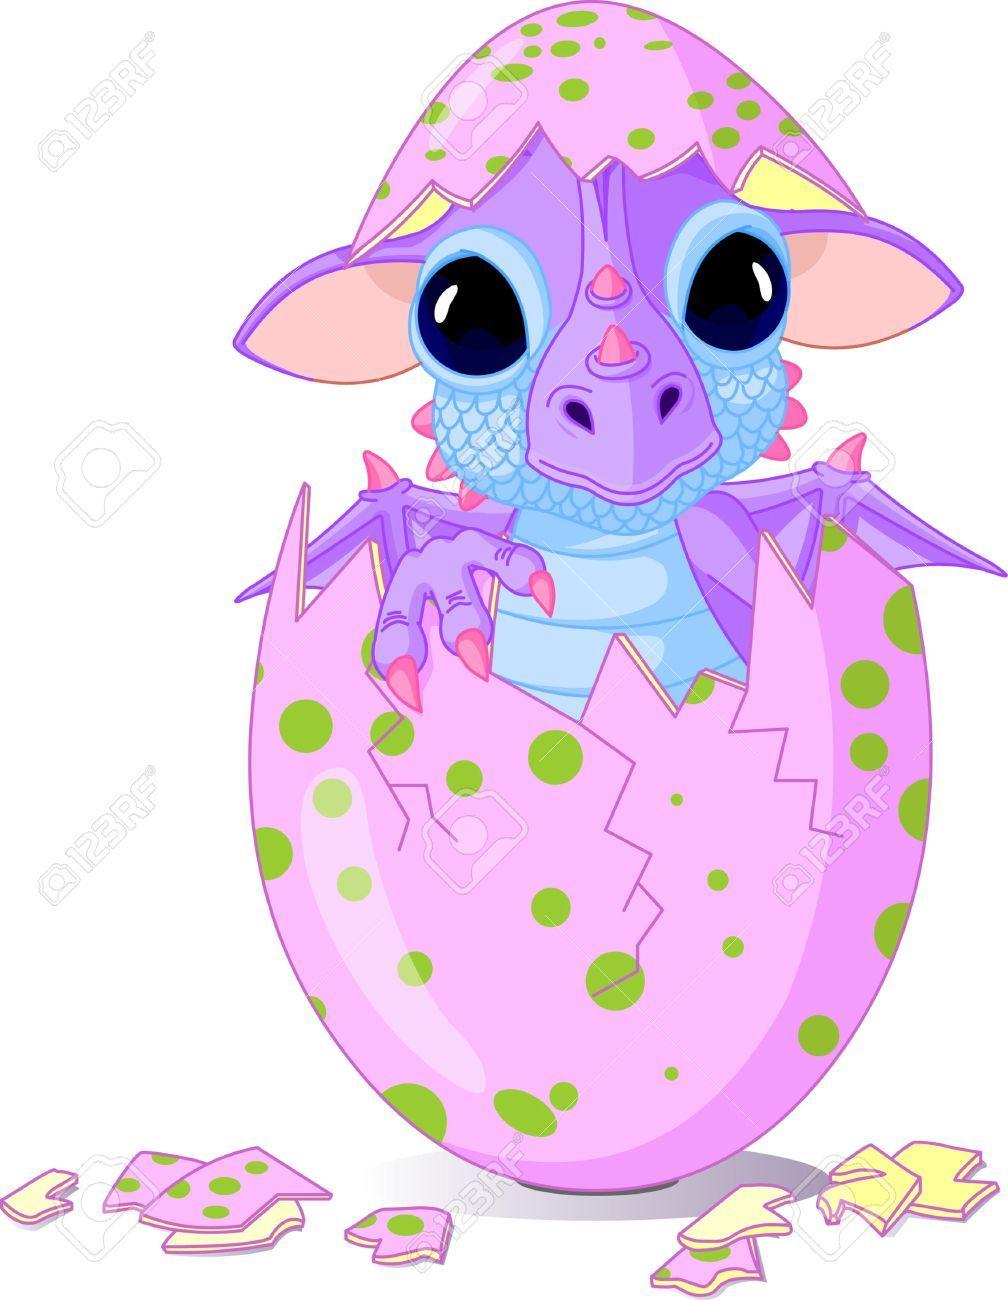 dragon egg hatching - Google Search | Dragon Eggs | Baby dragon